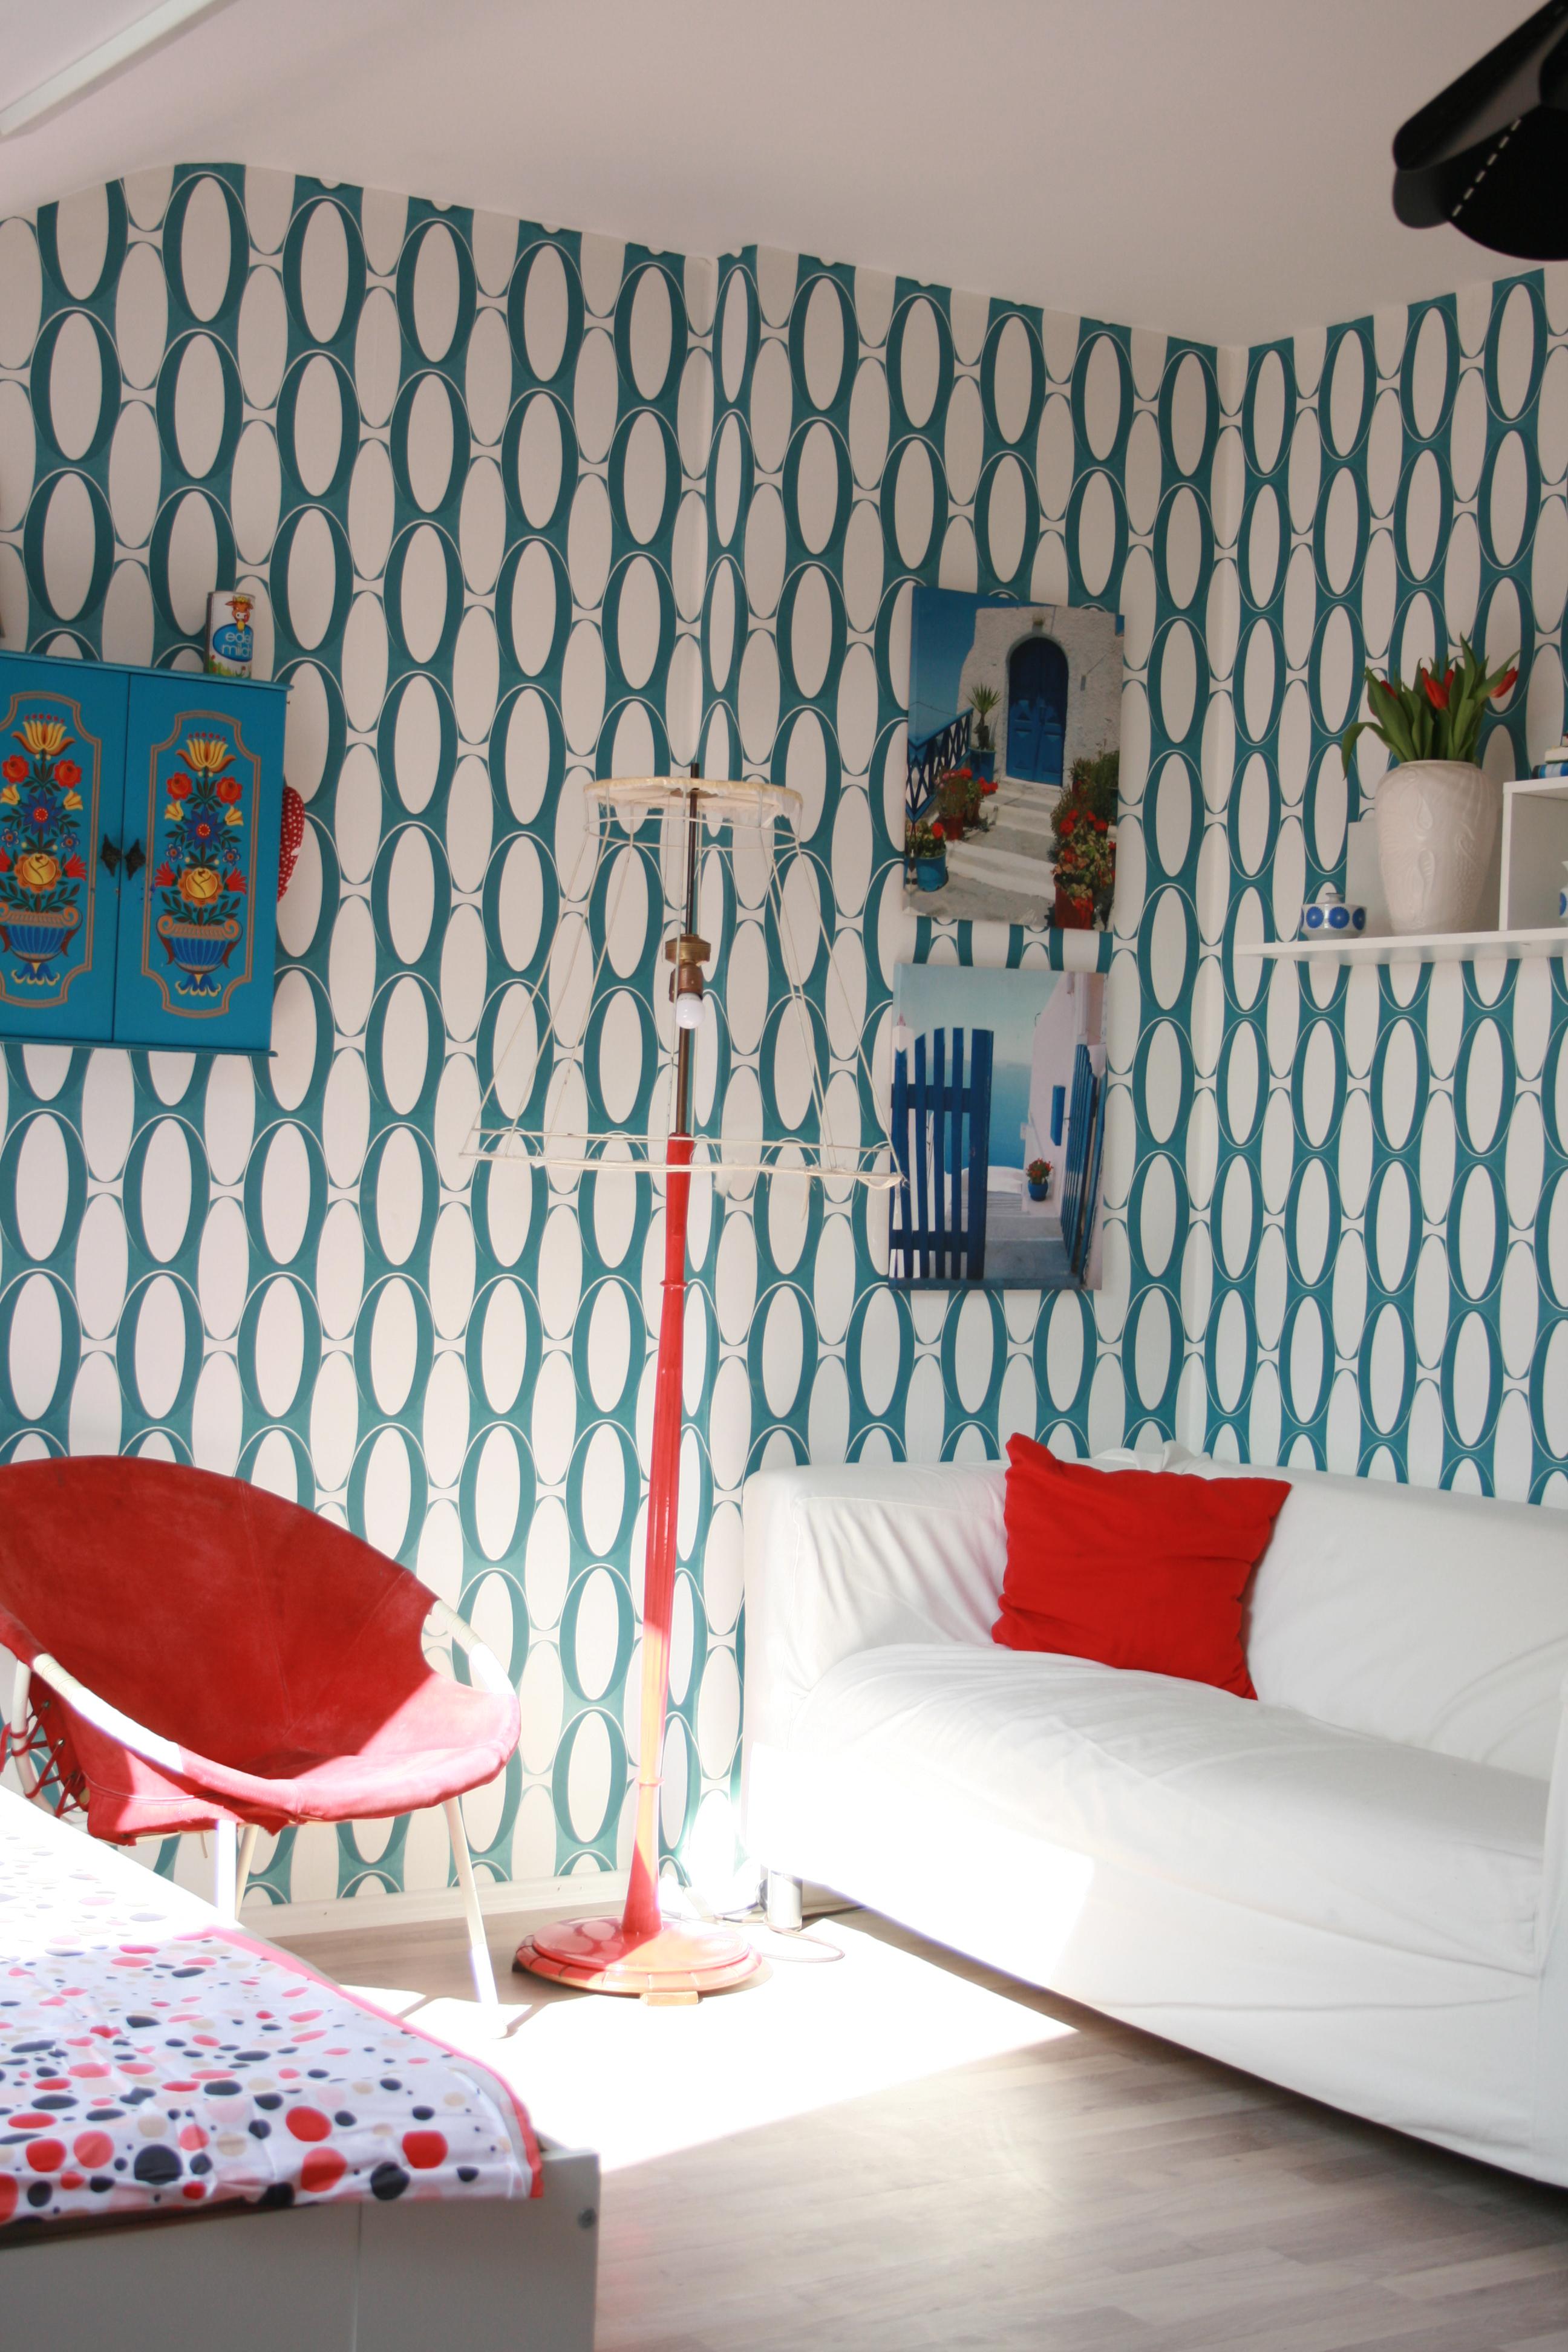 die 60er 70er jahre wohnung my home is my horst. Black Bedroom Furniture Sets. Home Design Ideas